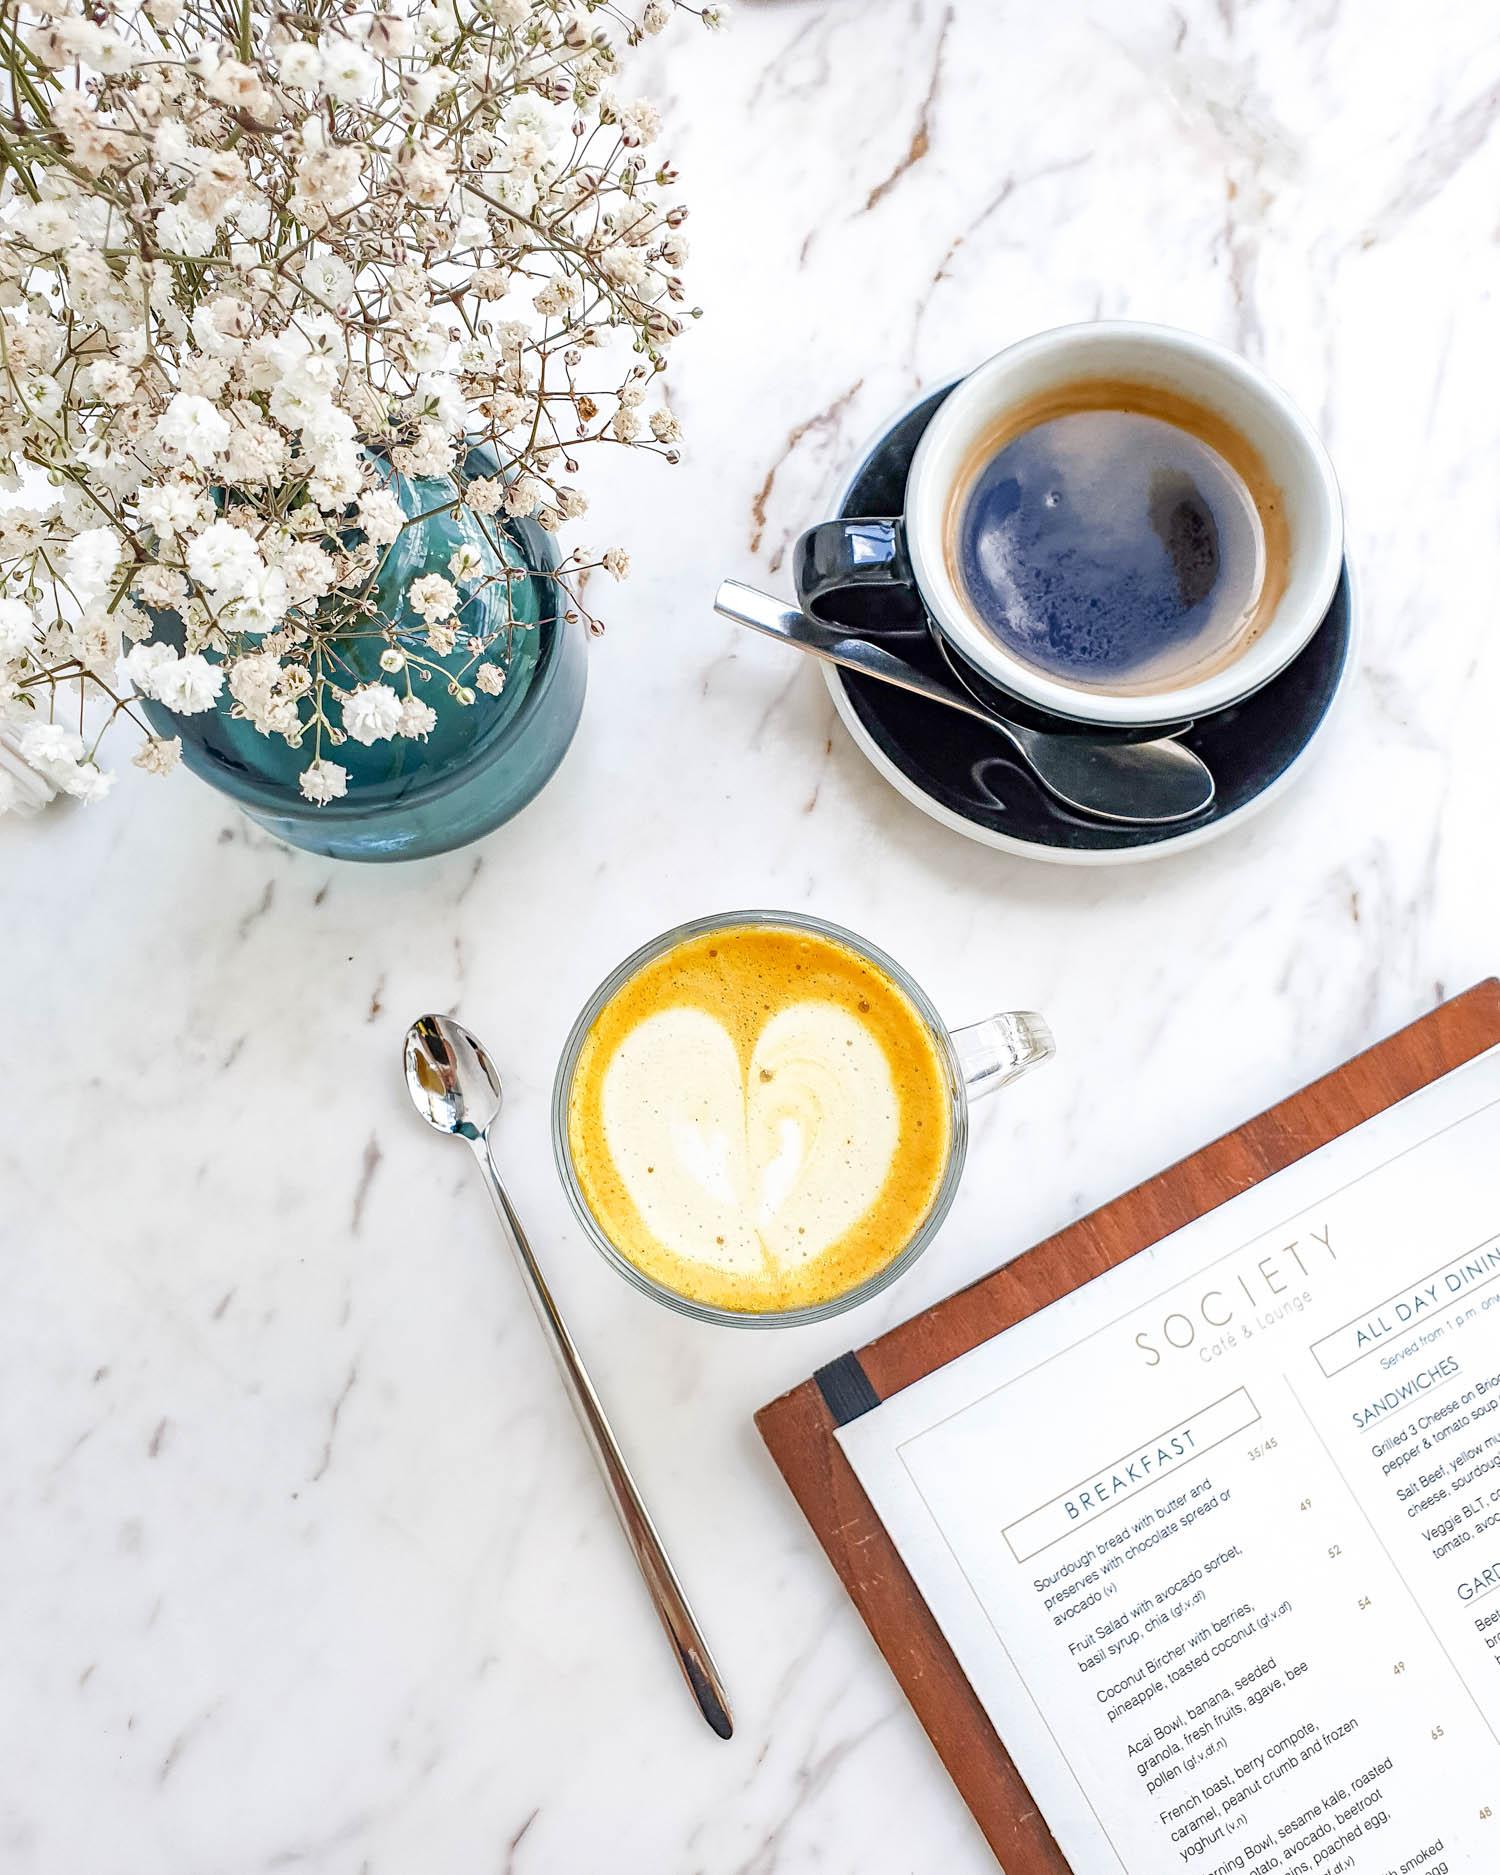 Turmeric latte from Society Cafe and Lounge | Dubai UAE